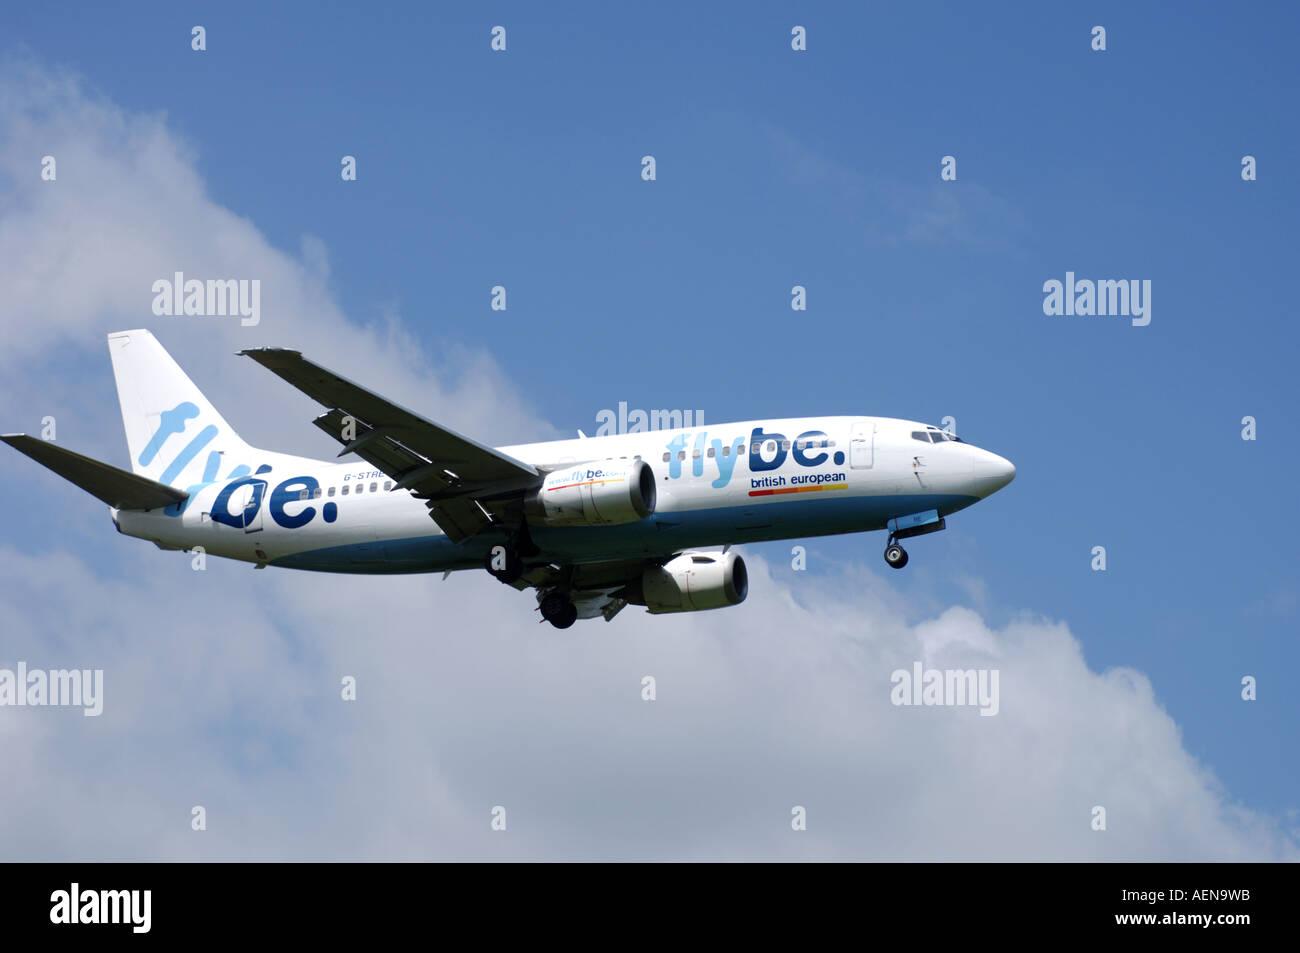 Boeing 737-36N Short- to Medium-range Twin-engine Narrow-body jJt Airliner Registration G-STRE.   XAV-280 - Stock Image